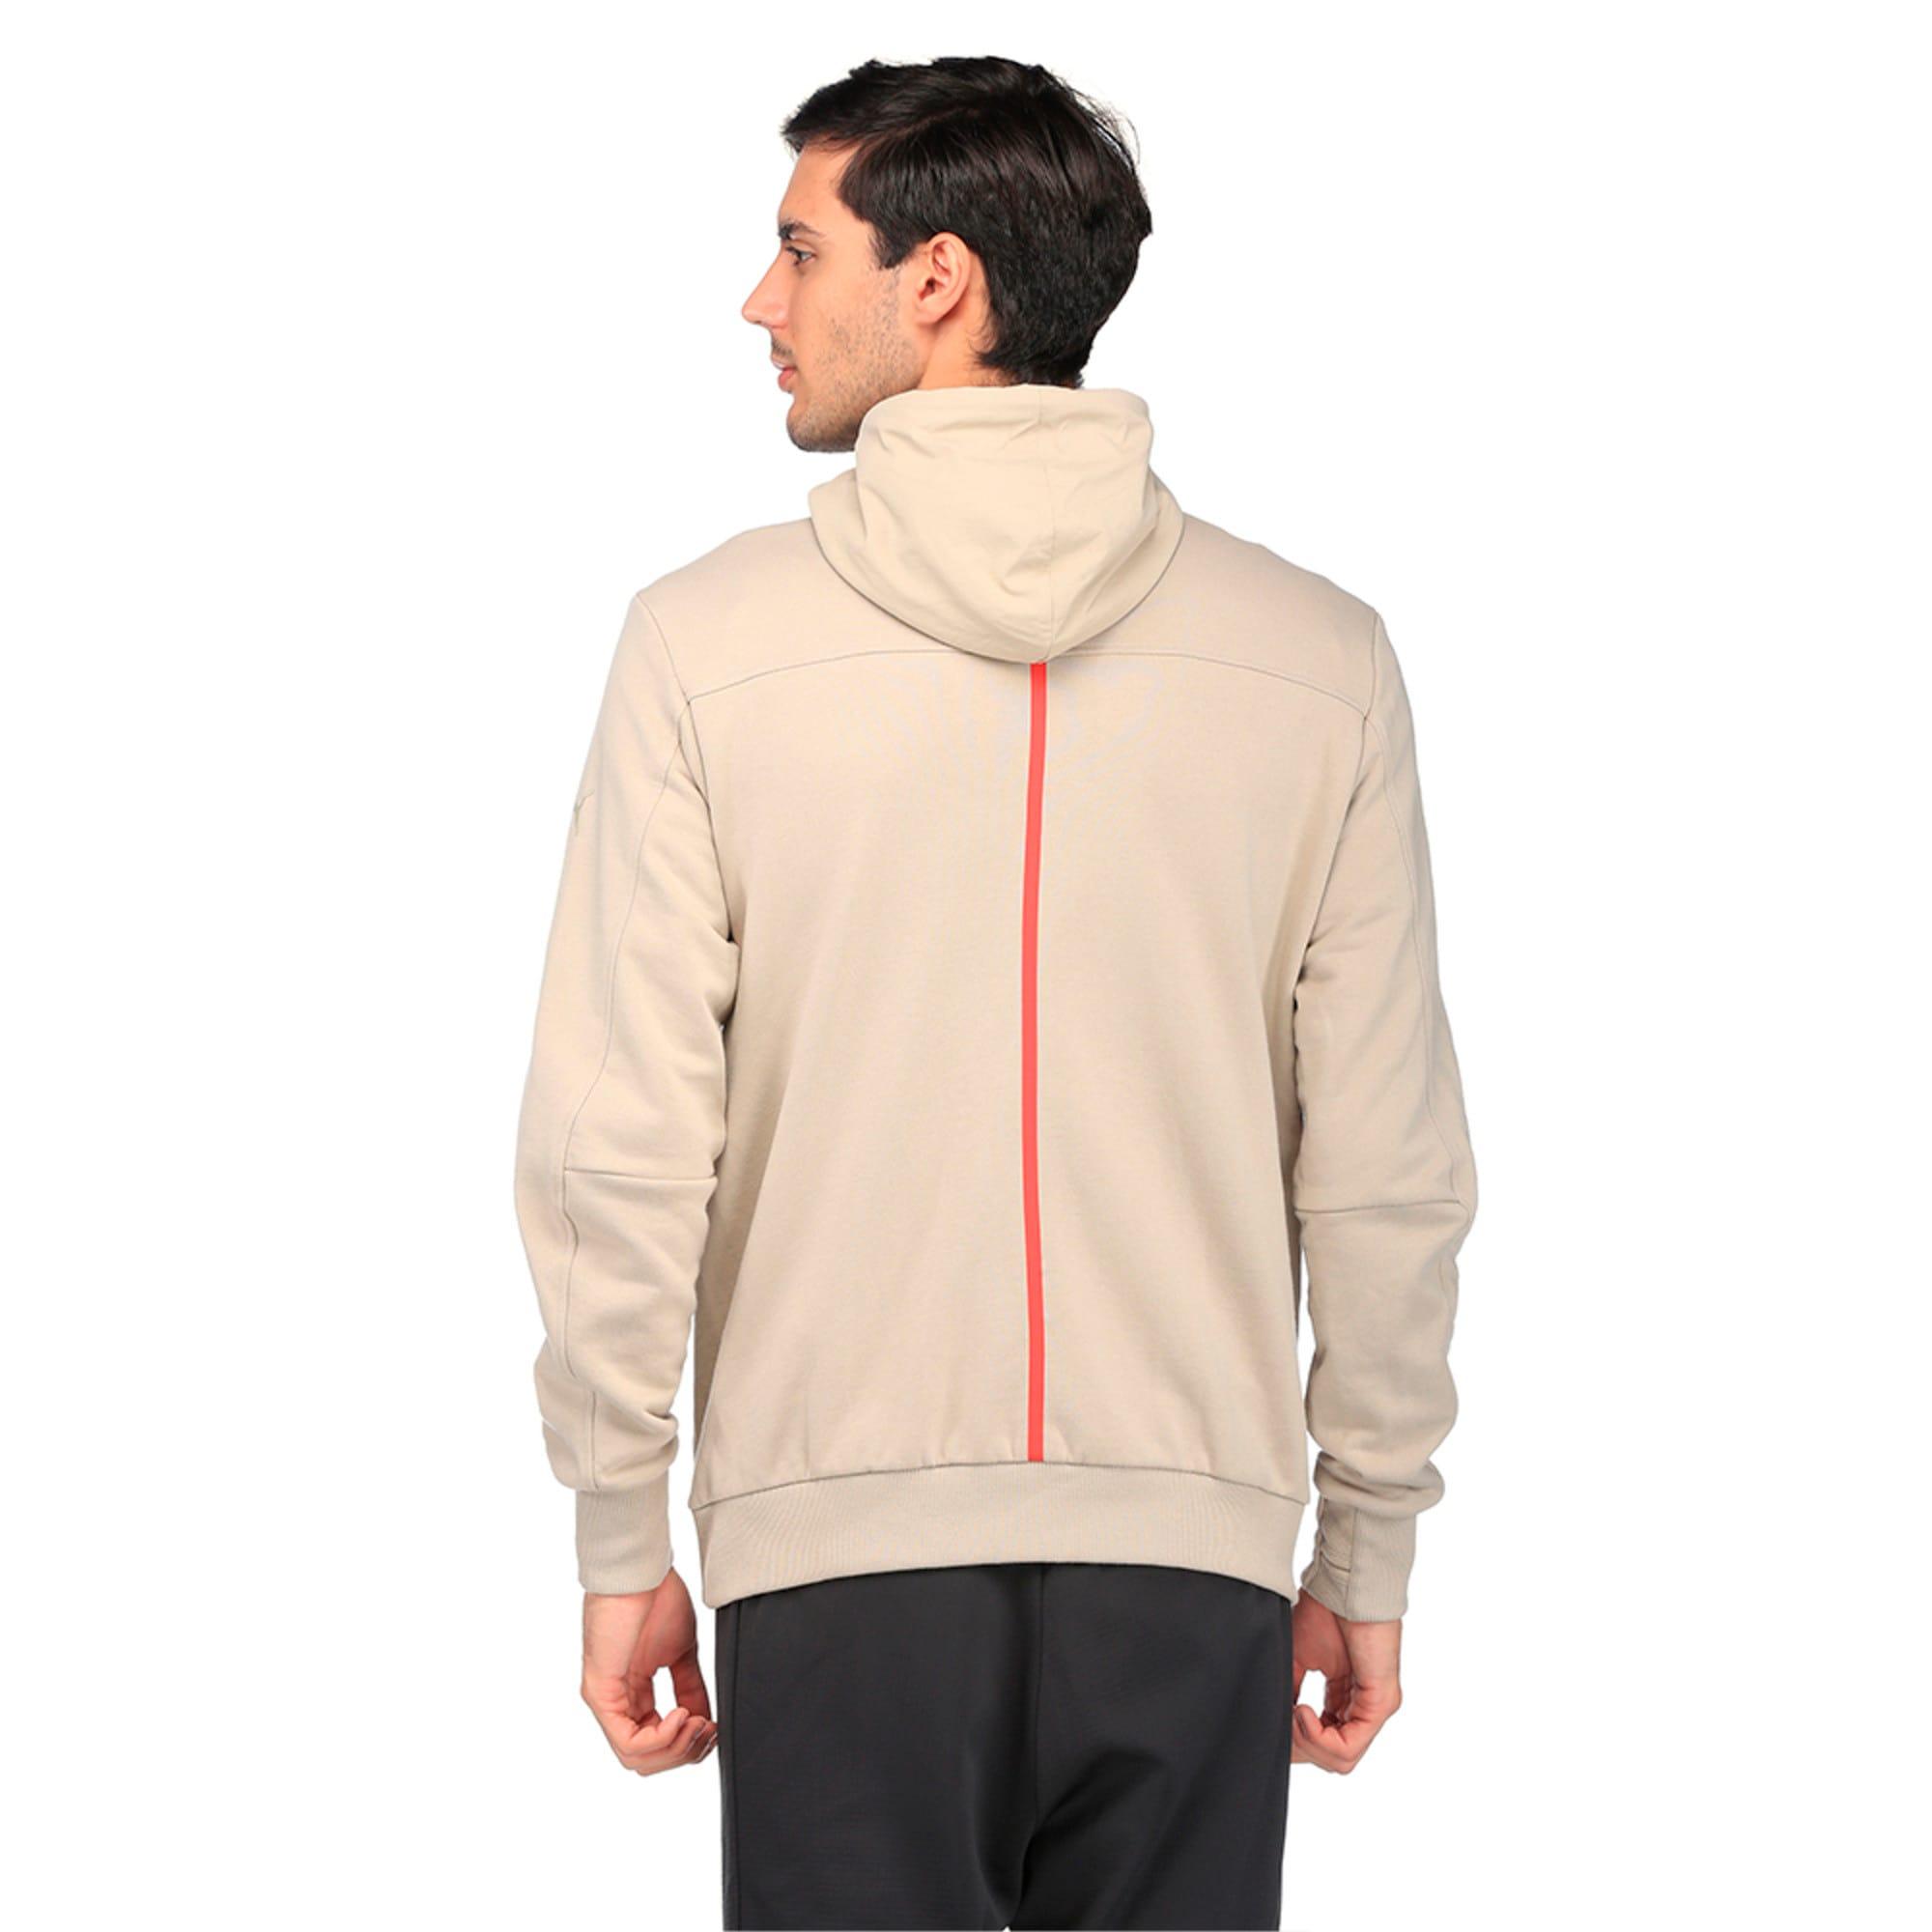 Thumbnail 2 of Ferrari Lifestyle Men's Hooded Sweat Jacket, Pure Cashmere, medium-IND